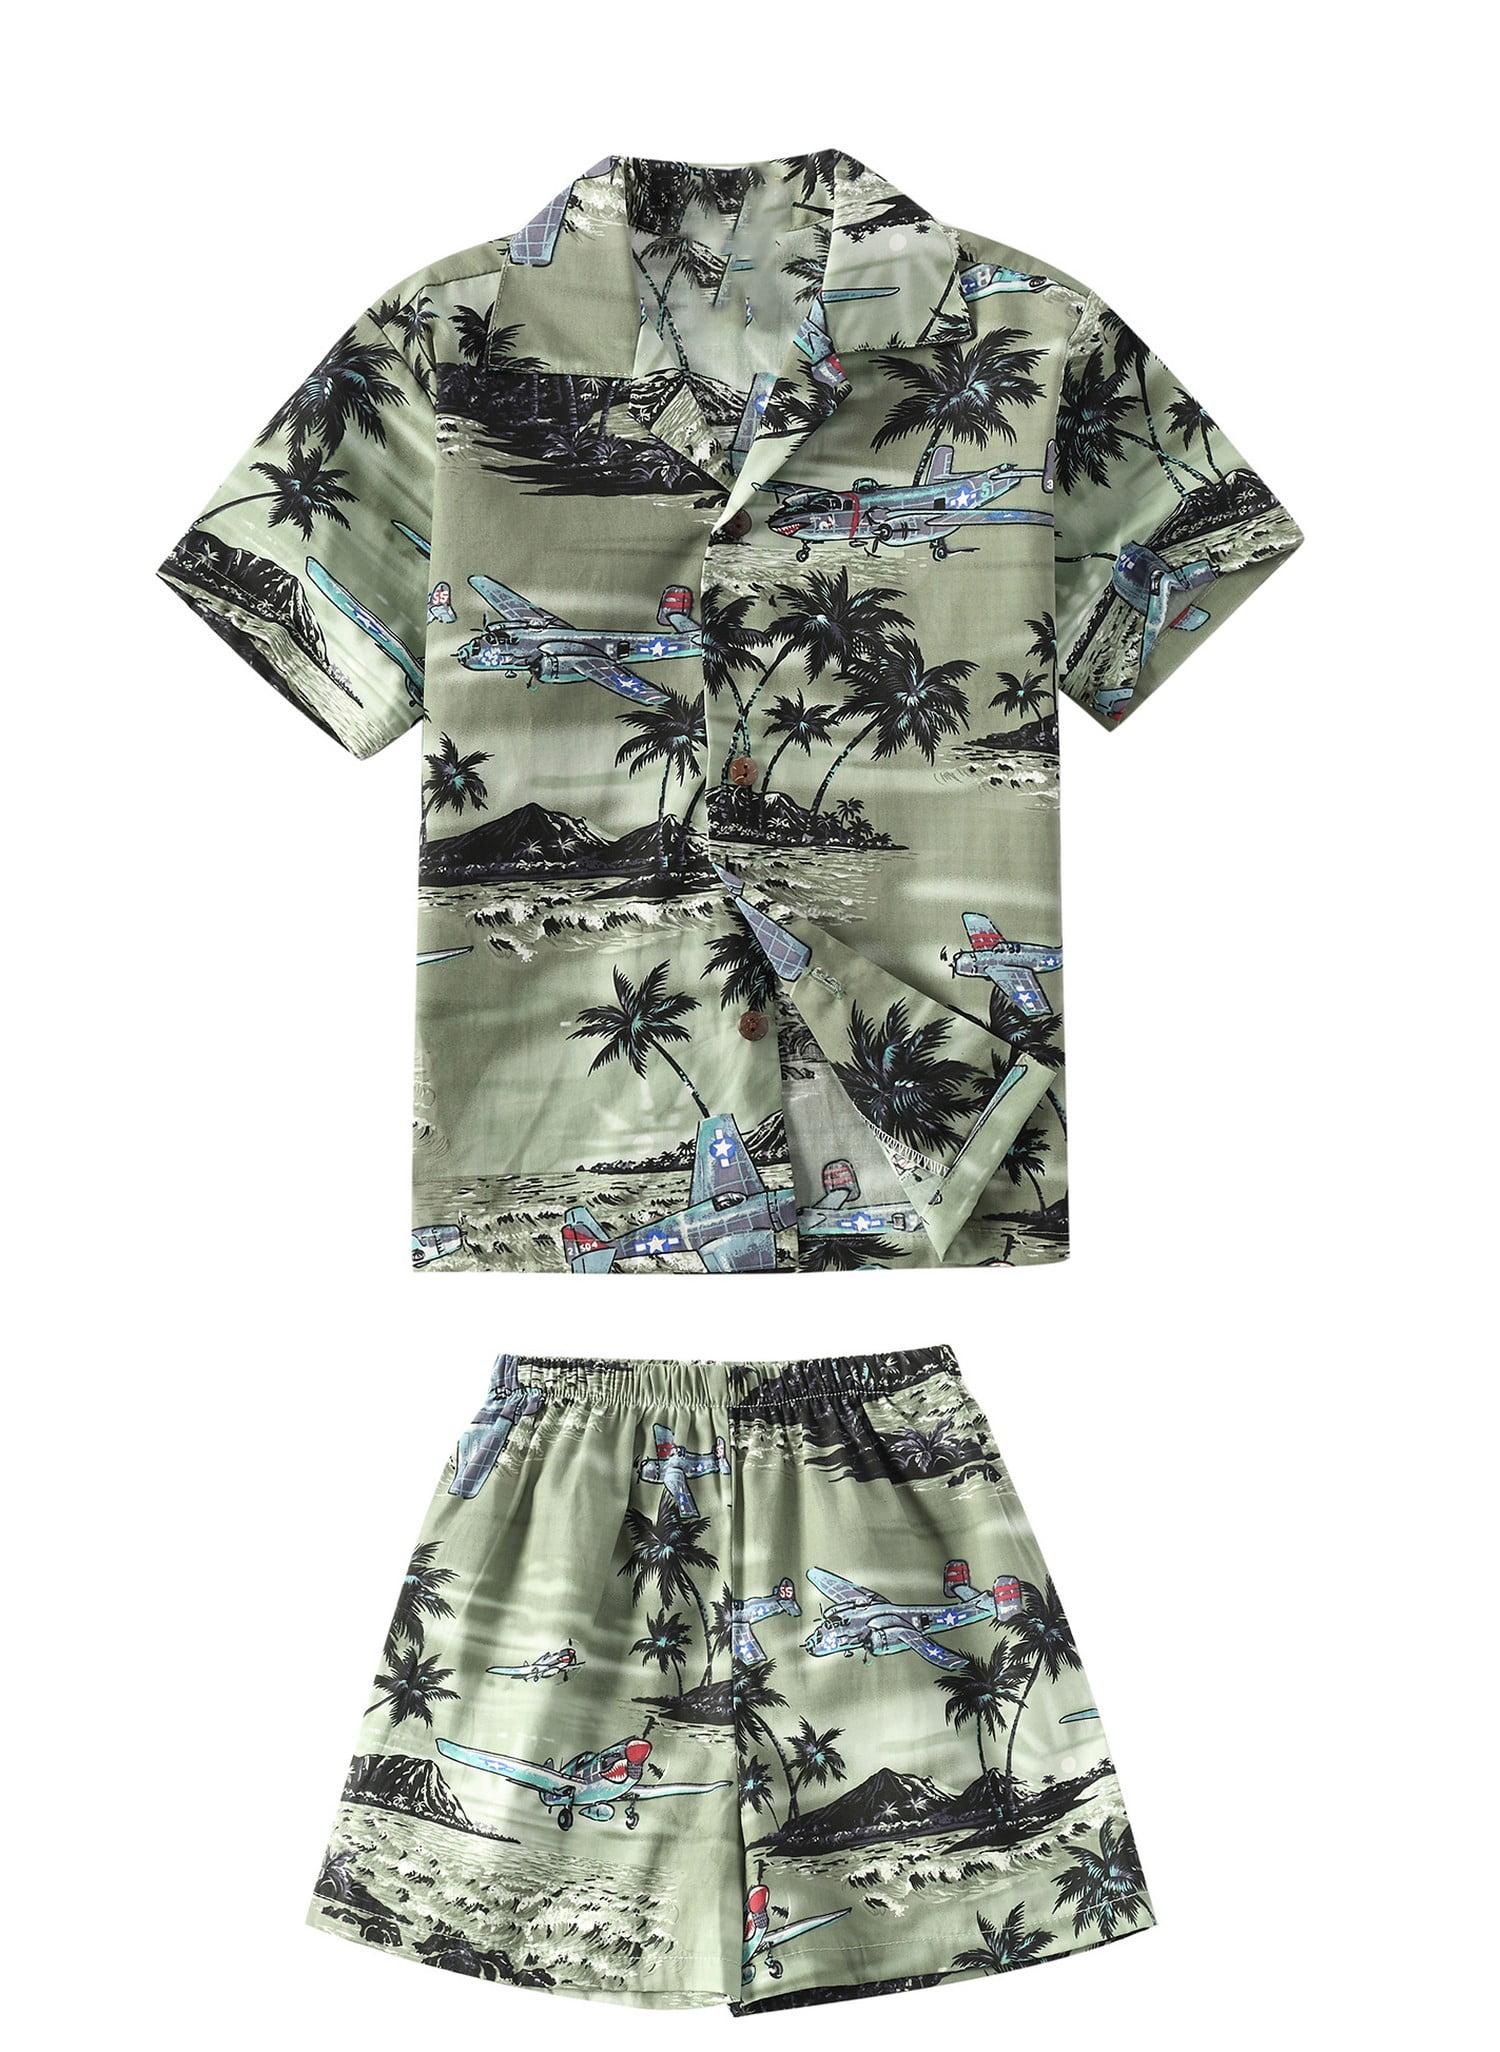 Made in Hawaii Luau Aloha Shirt and Shorts Boy Cabana Set Airplanes Jets and Palms Blue 8